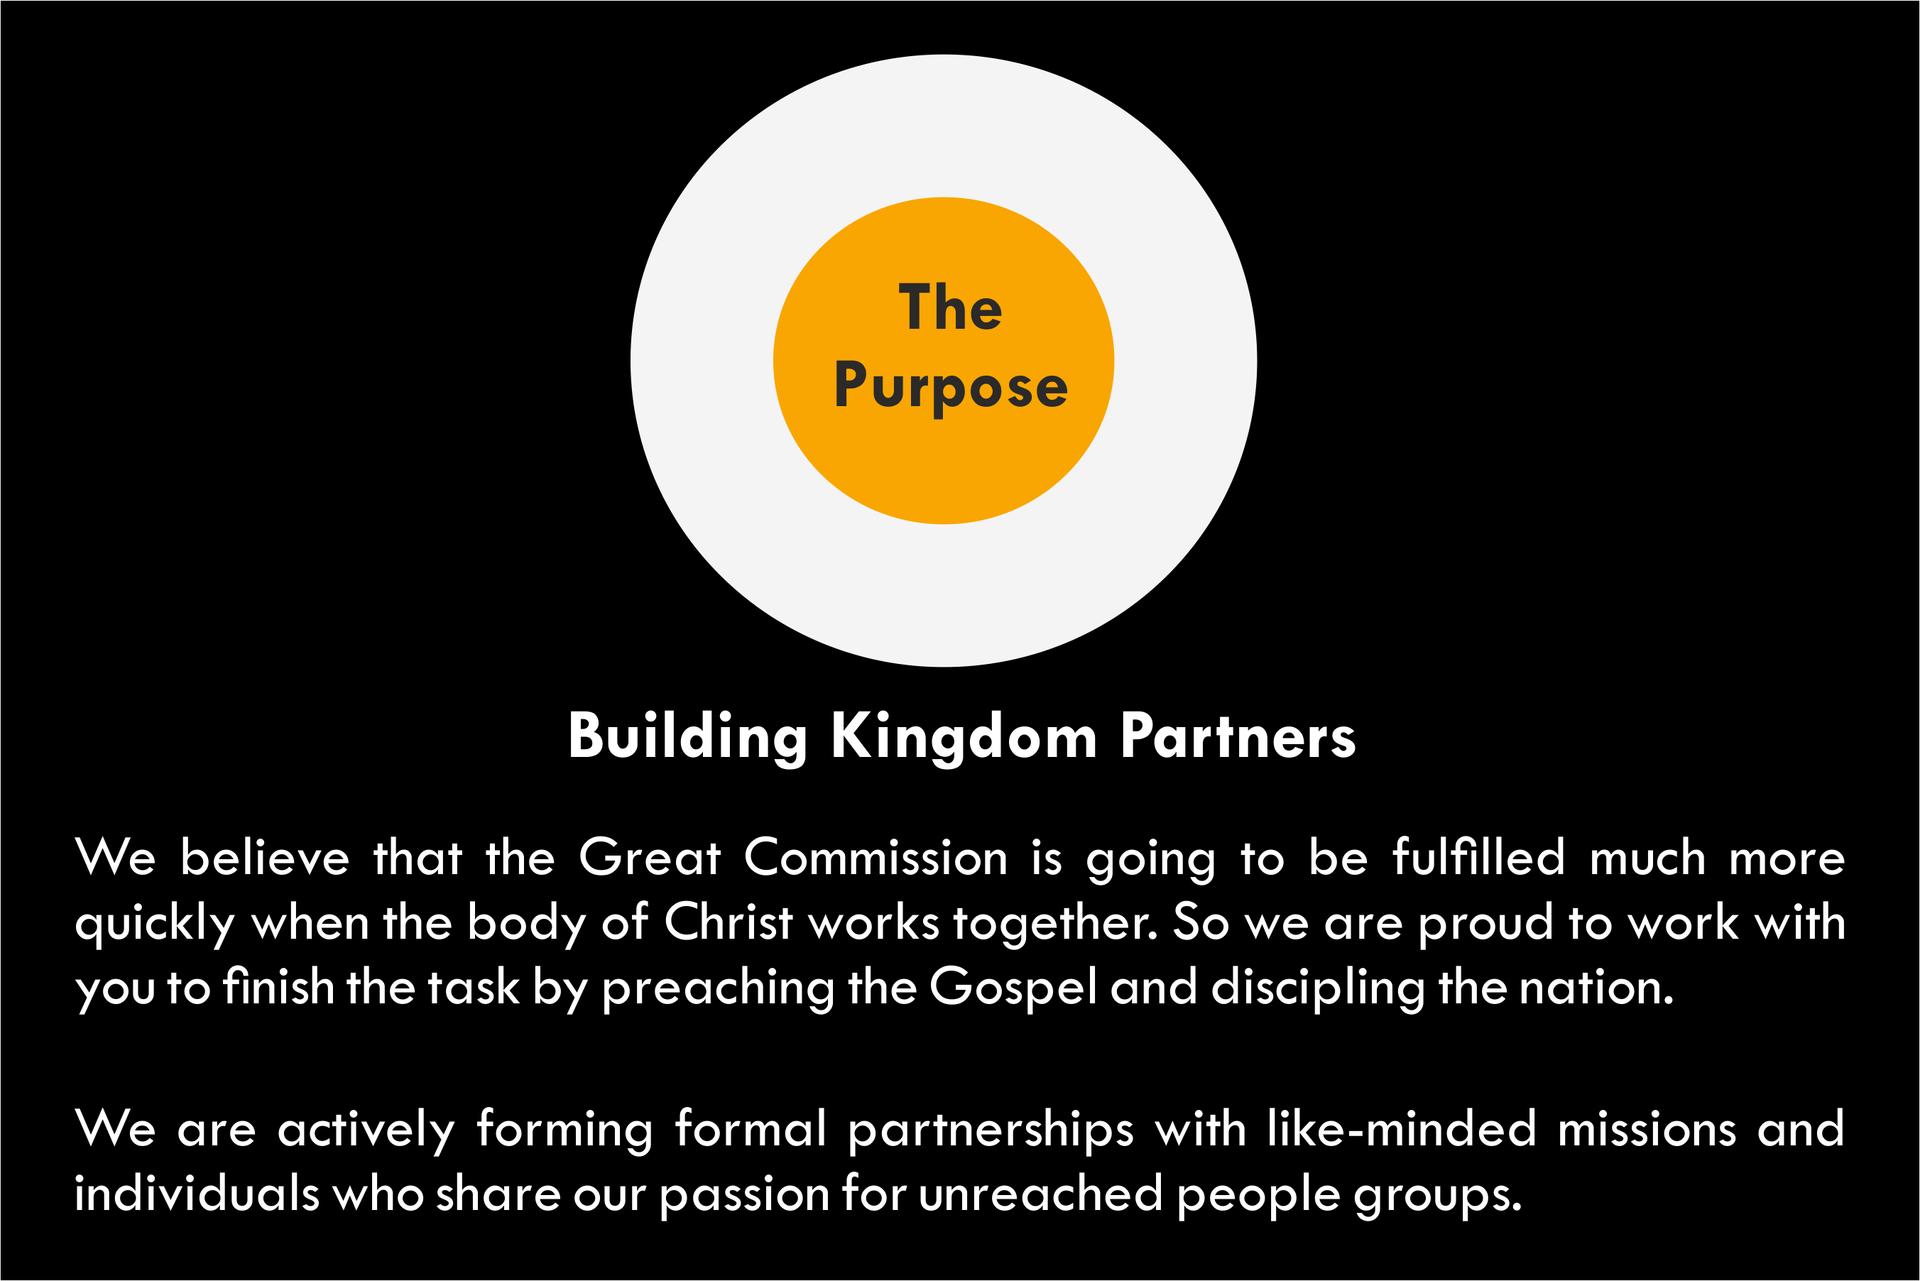 Building Kingdom Partners